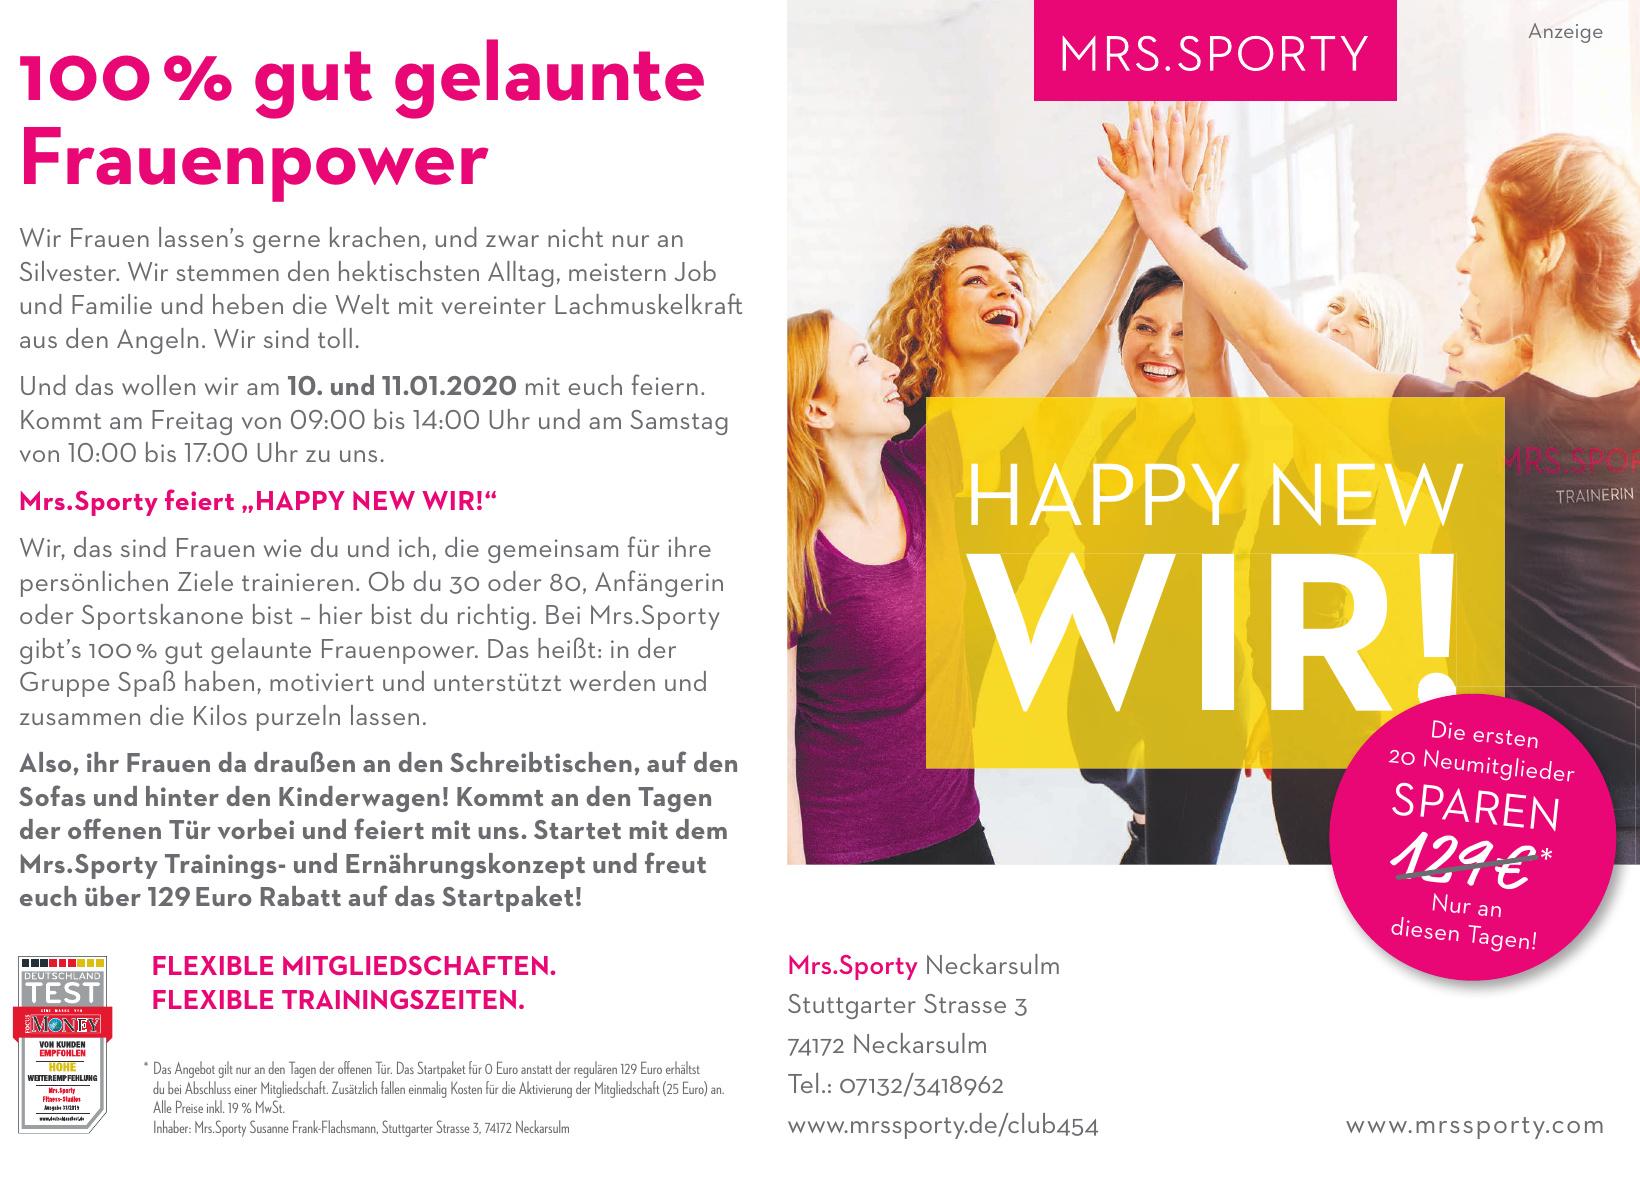 Mrs. Sporty Neckarsulm